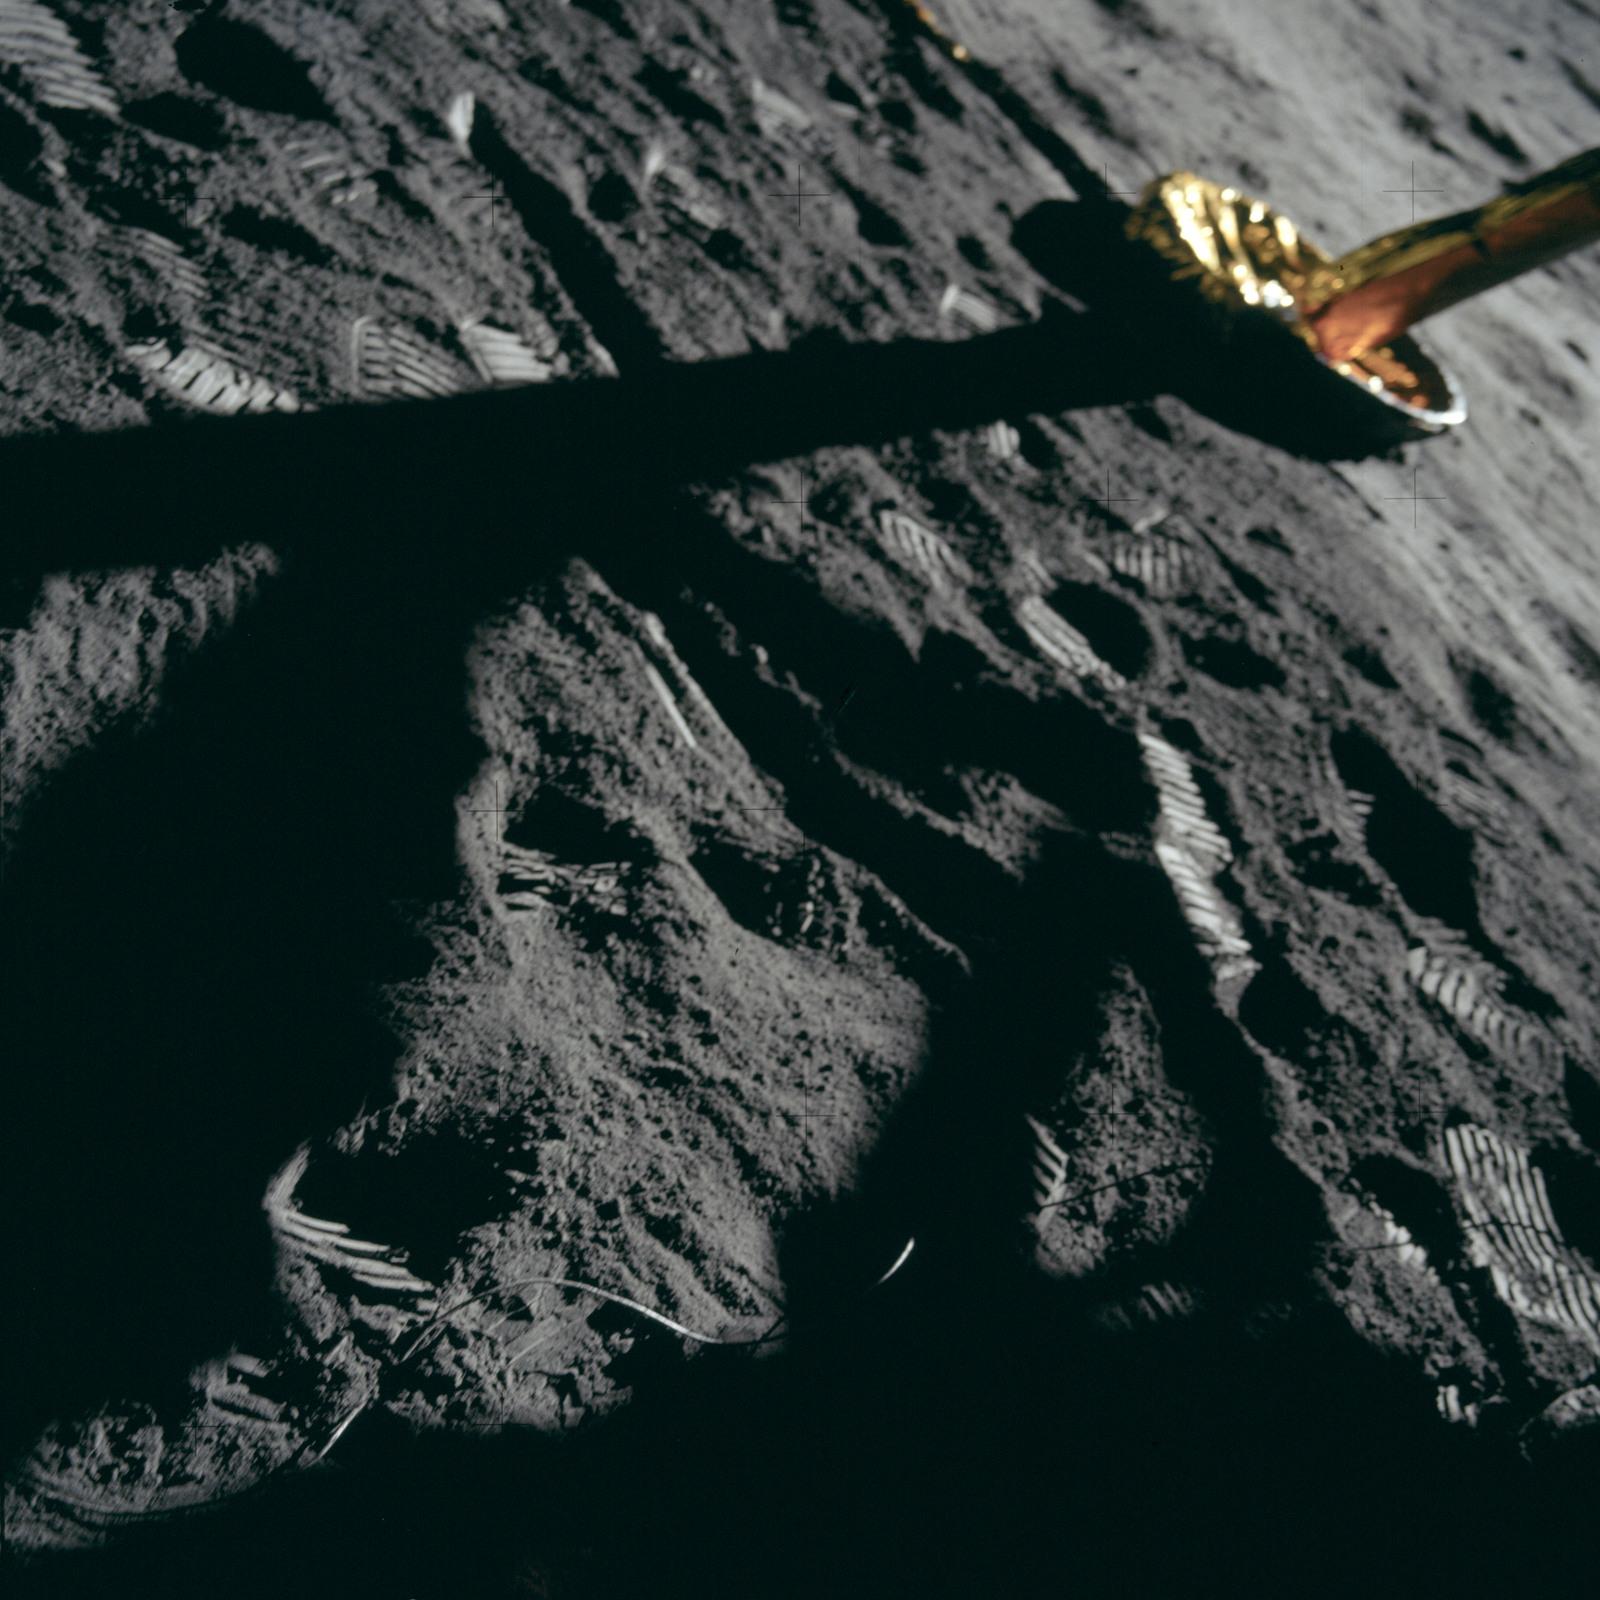 AS11-40-5901 - Apollo 11 - Apollo 11 Mission image -  Lunar surface and Lunar Module footpad